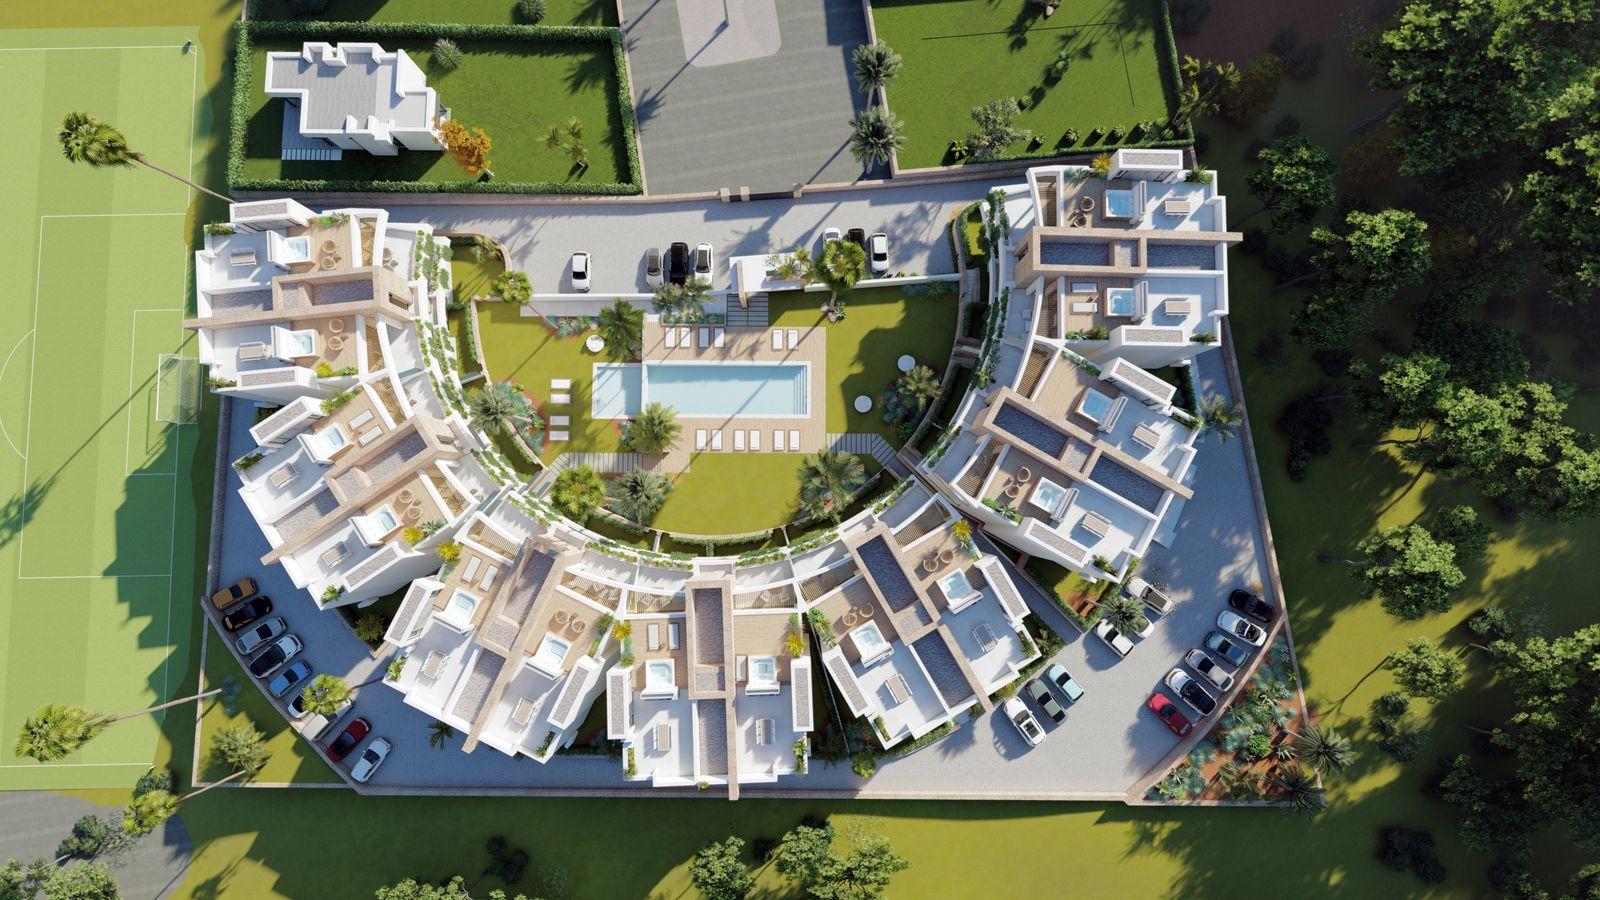 New 2 bedroom apartments for sale in La Manga Golf Resort – Murcia